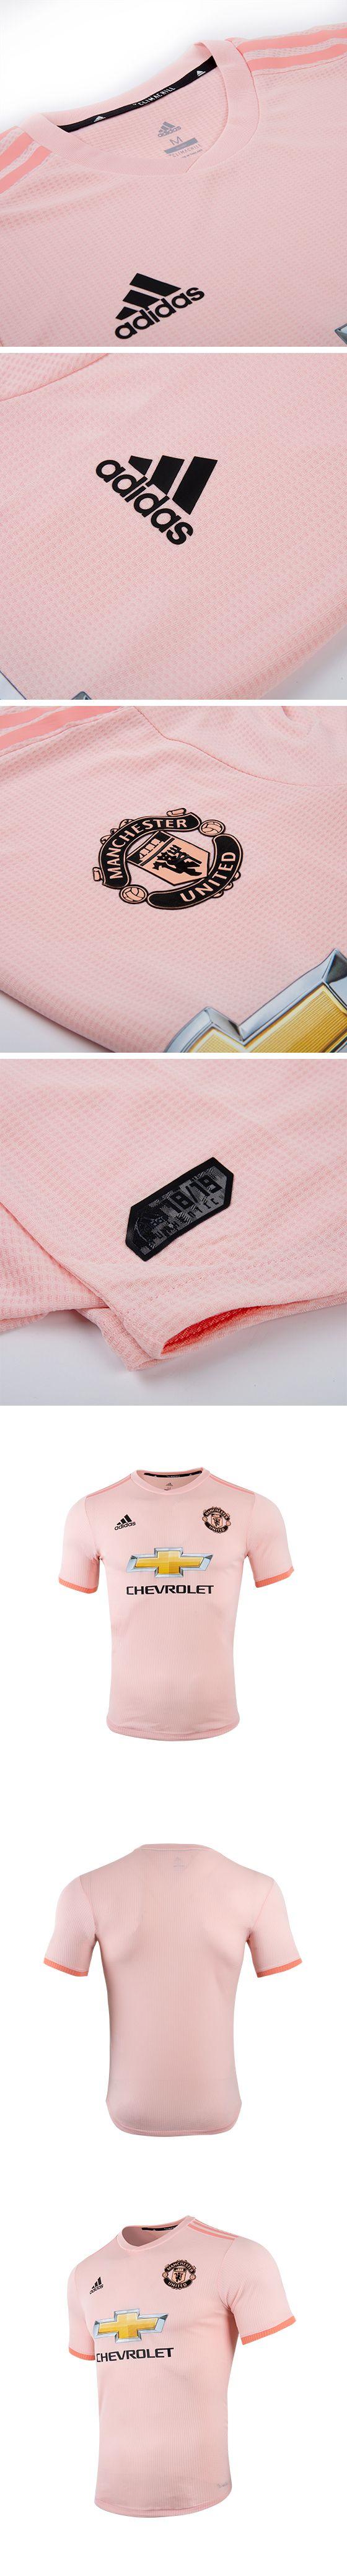 cdef22d80 18-19 Manchester United Away Pink Jersey Shirt(Player Version ...